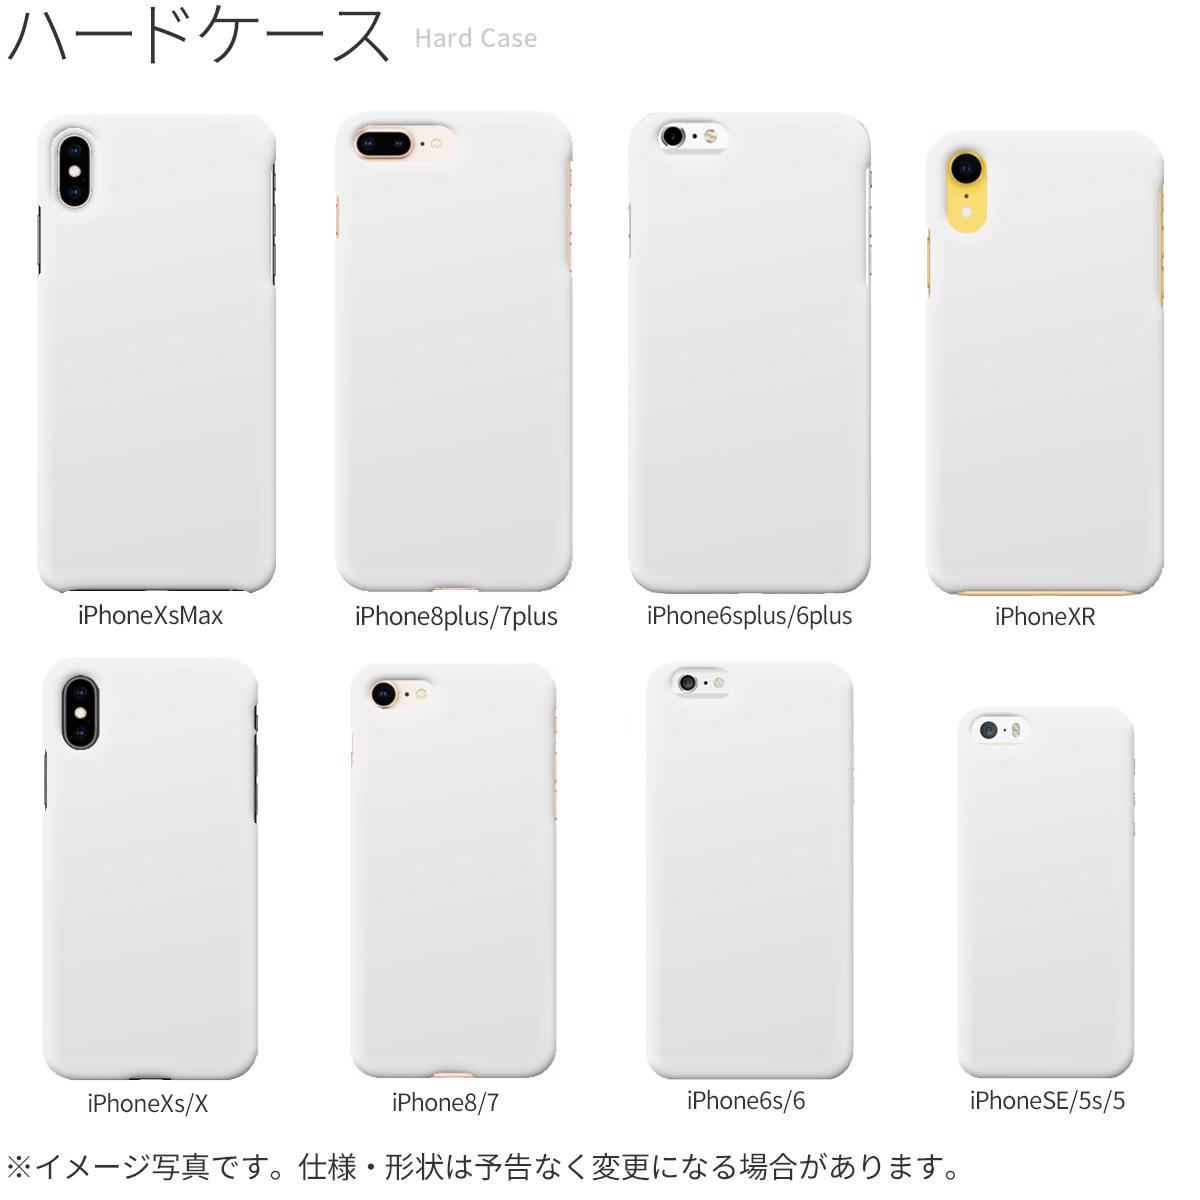 iPhoneXR iPhoneXs iphoneX iPhone8 iPhone7 iPhone6s iPhone6 iphoneSE iPhone5s iPhone5 ケース ハード